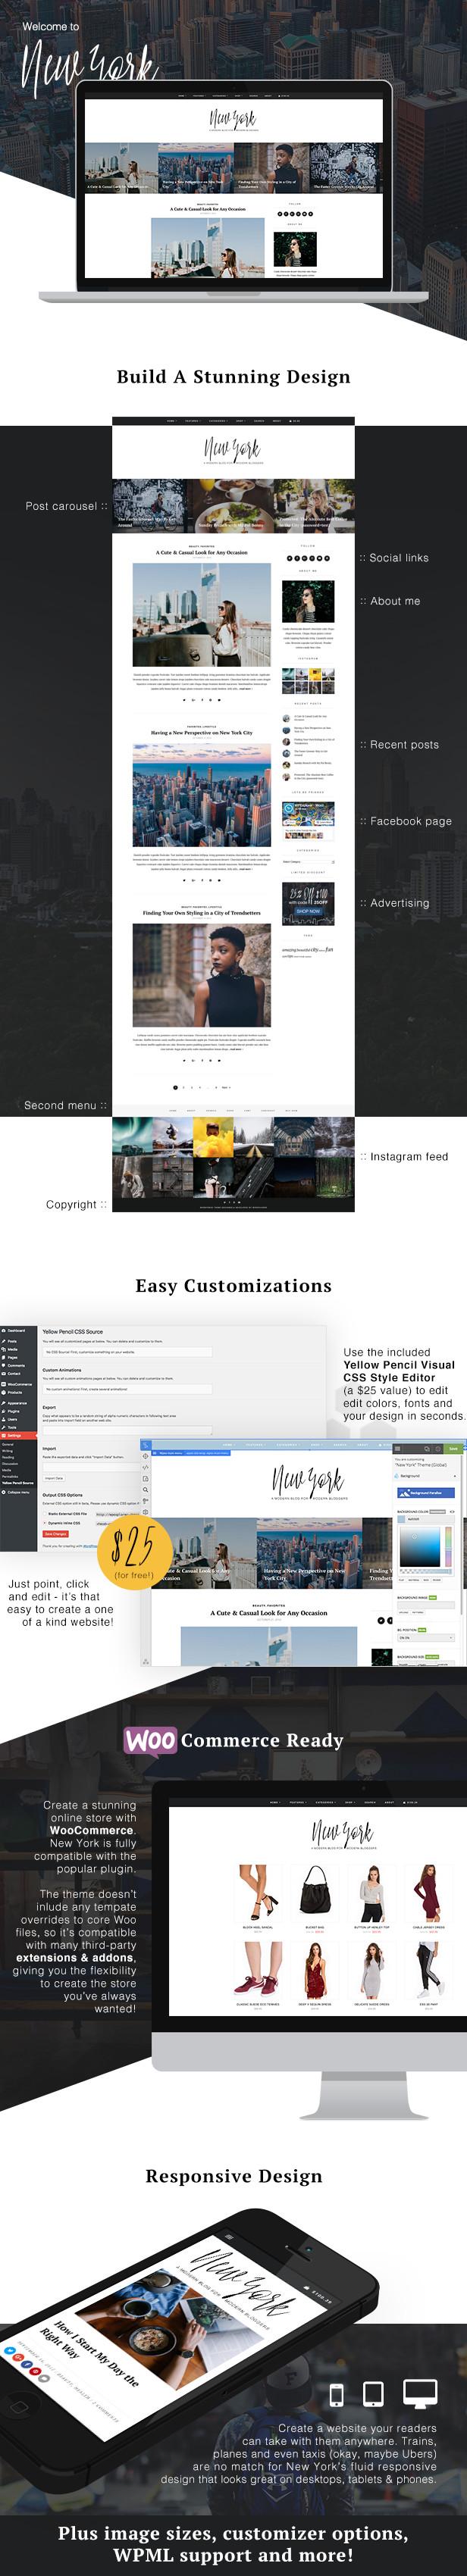 New York WordPress Theme Features